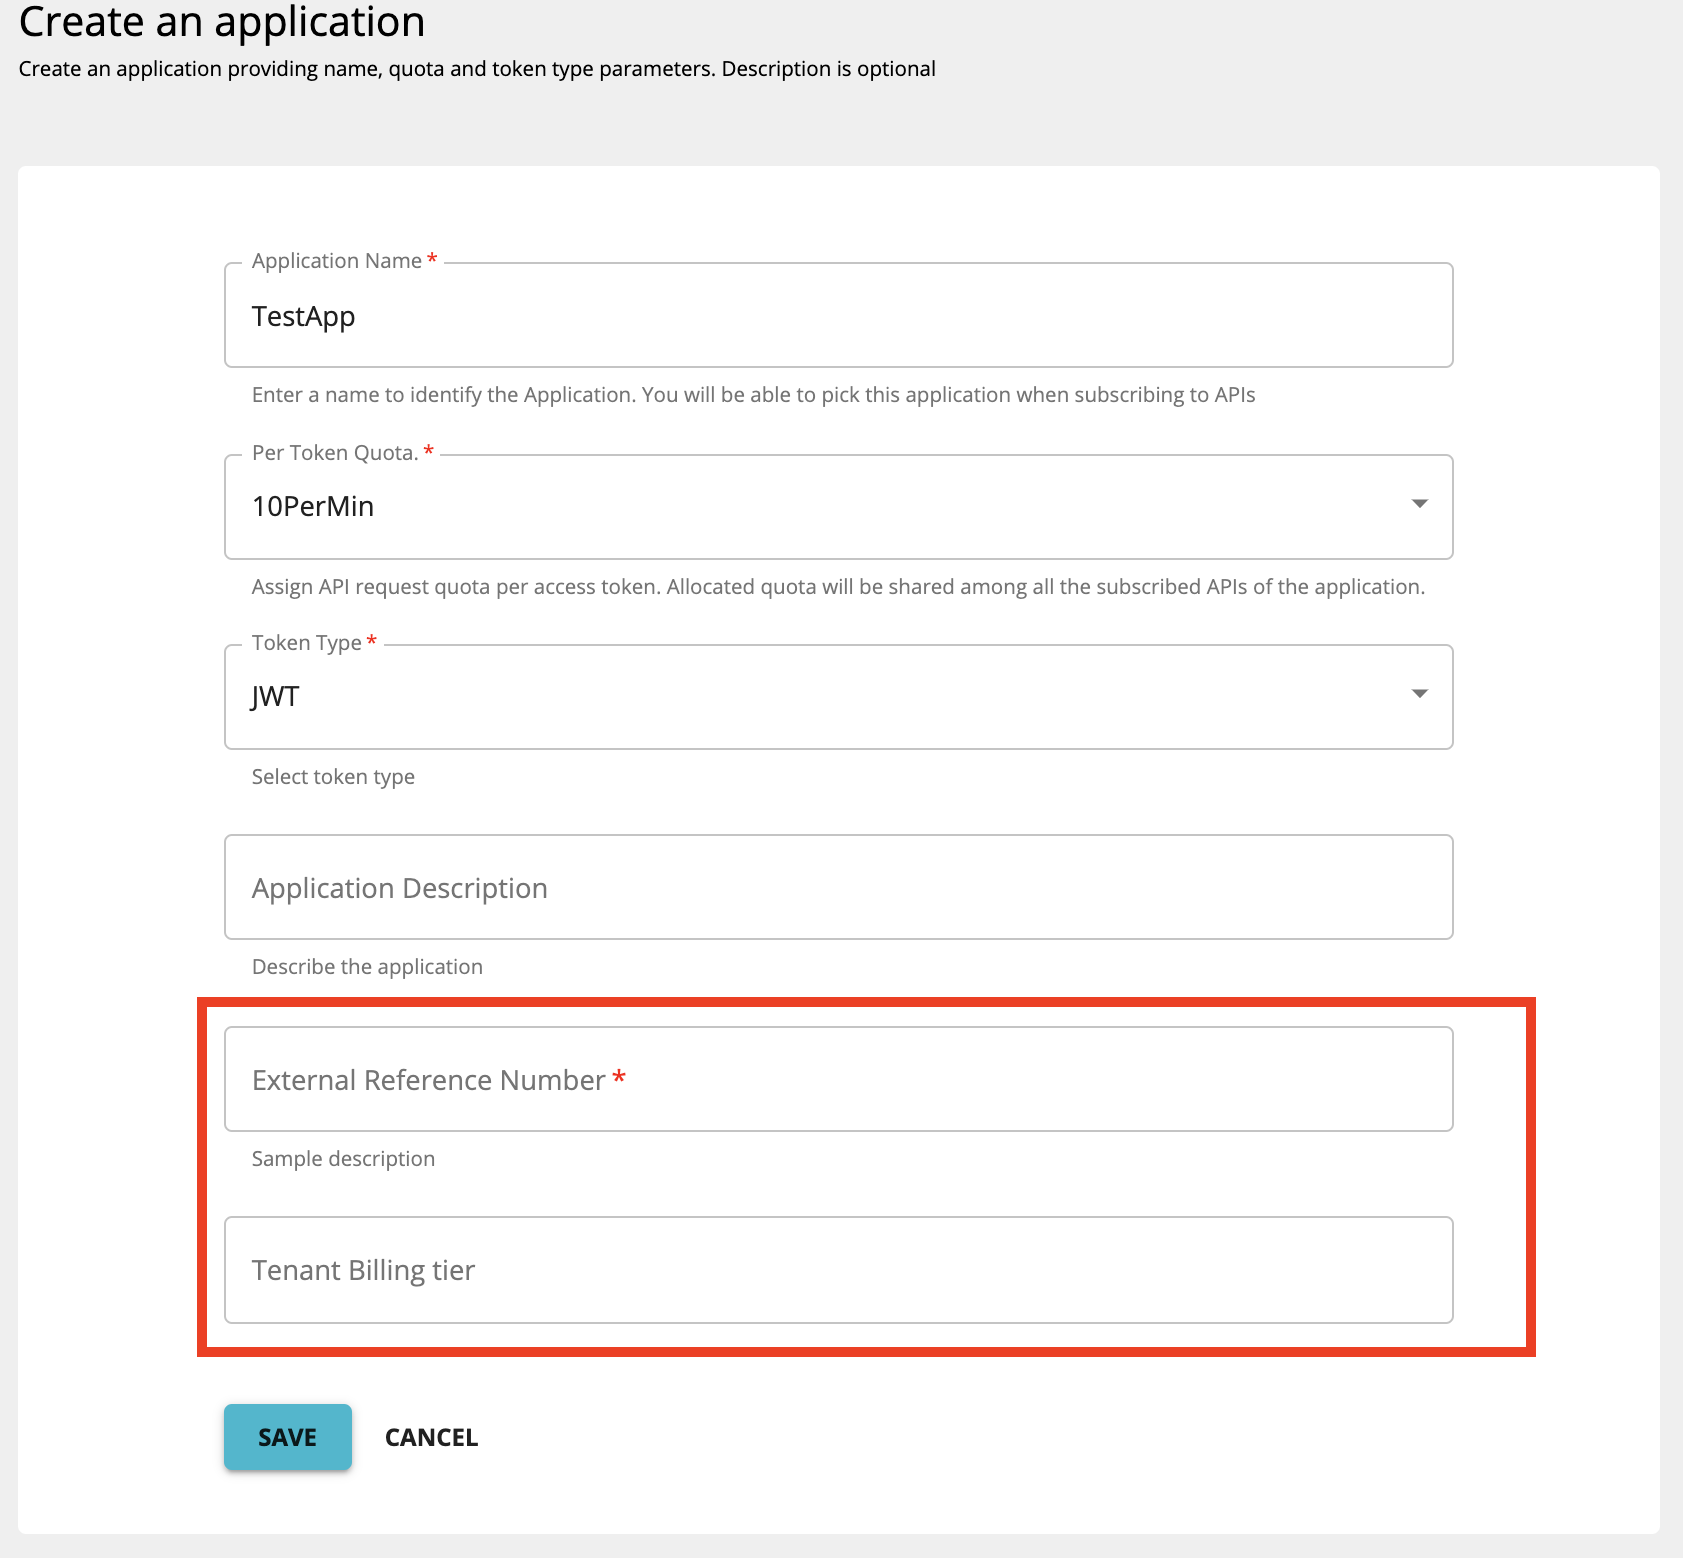 Custom application attributes